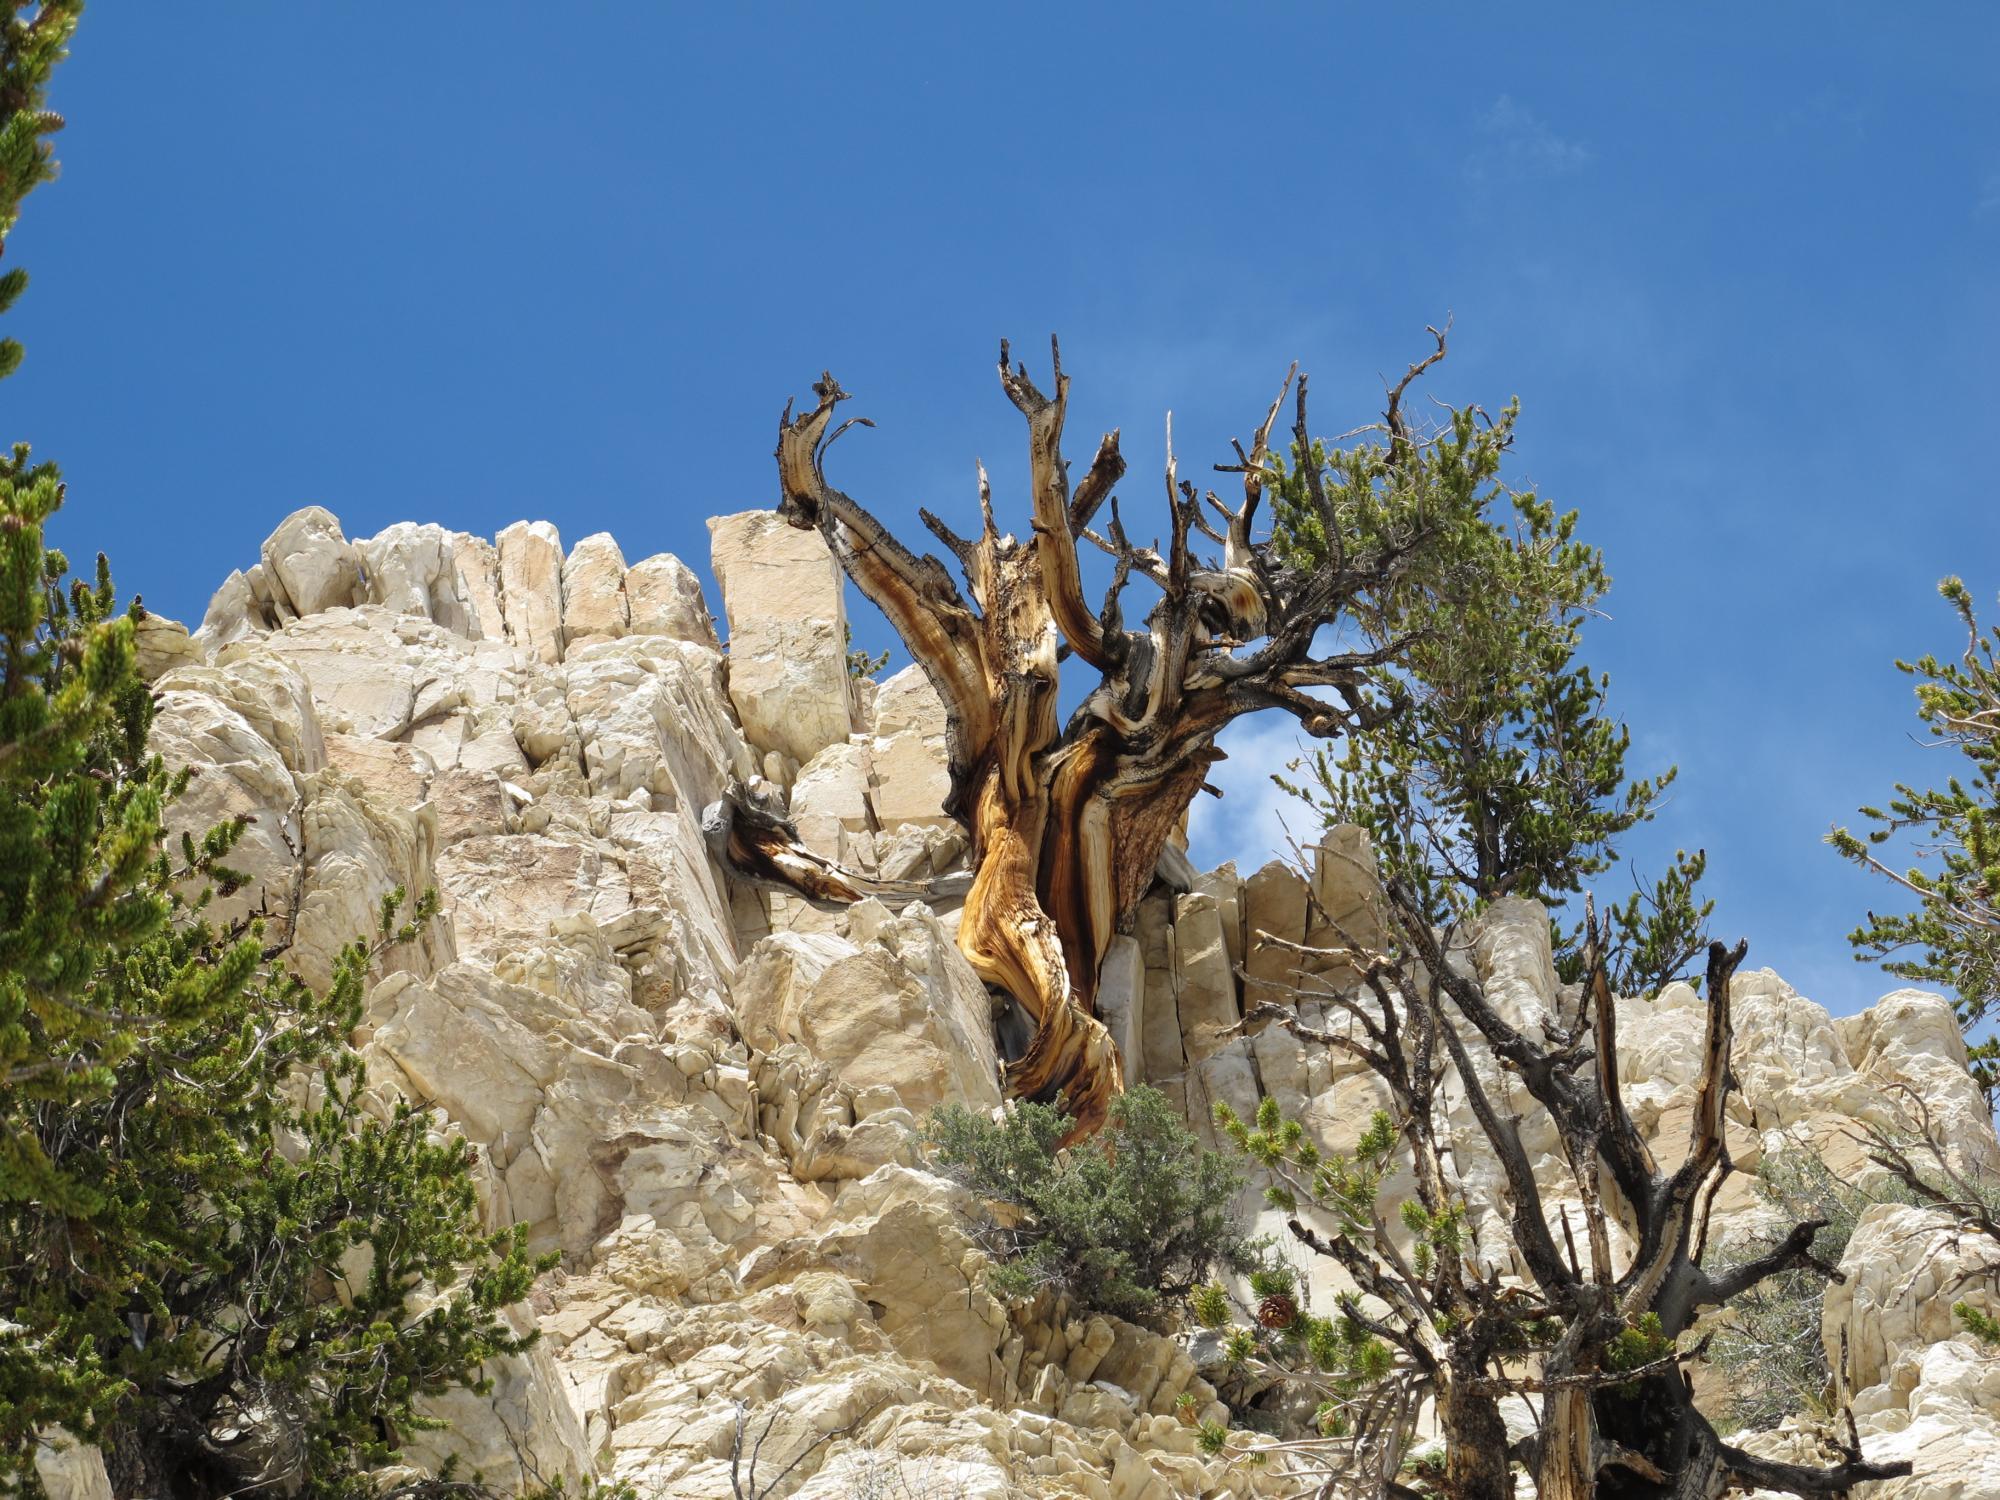 bristlecone pine on rock ledge